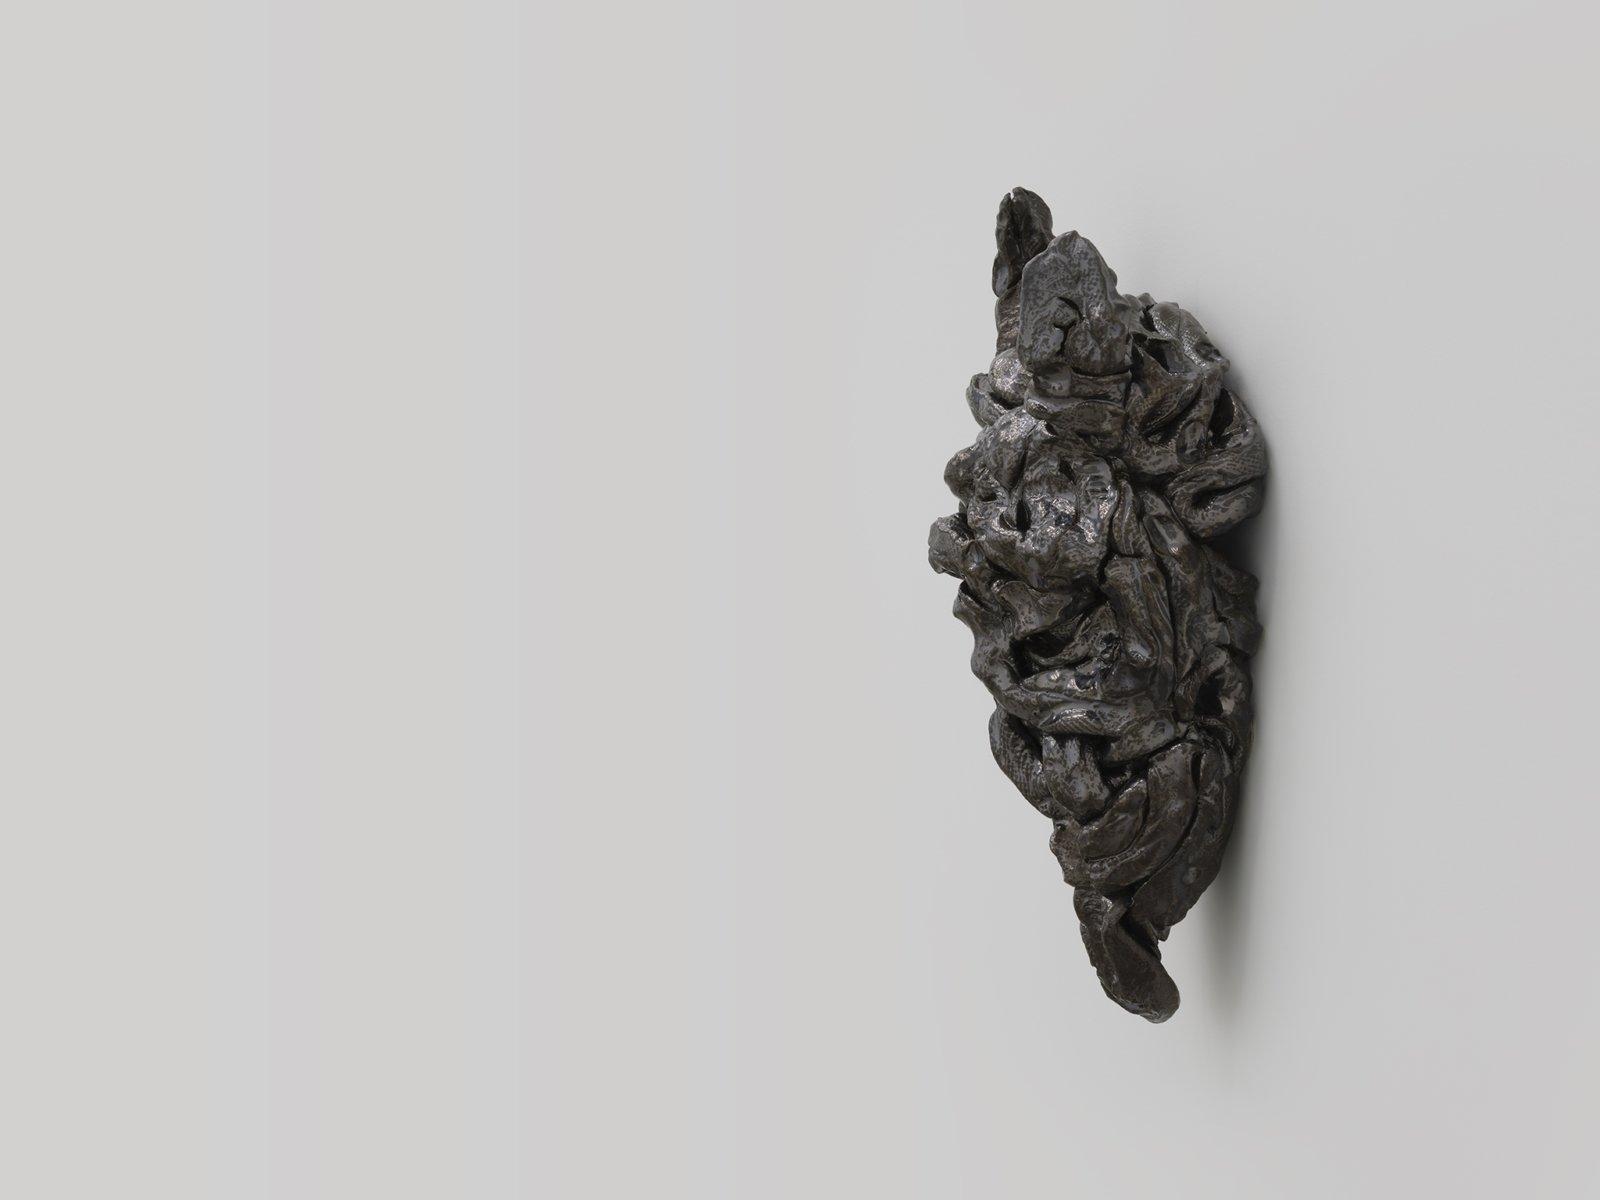 Rochelle Goldberg, Gatekeeper: What is breathing within this body, 2019, glazed ceramic, 21 x 7 x 12 in. (53 x 18 x 31 cm) by Rochelle Goldberg